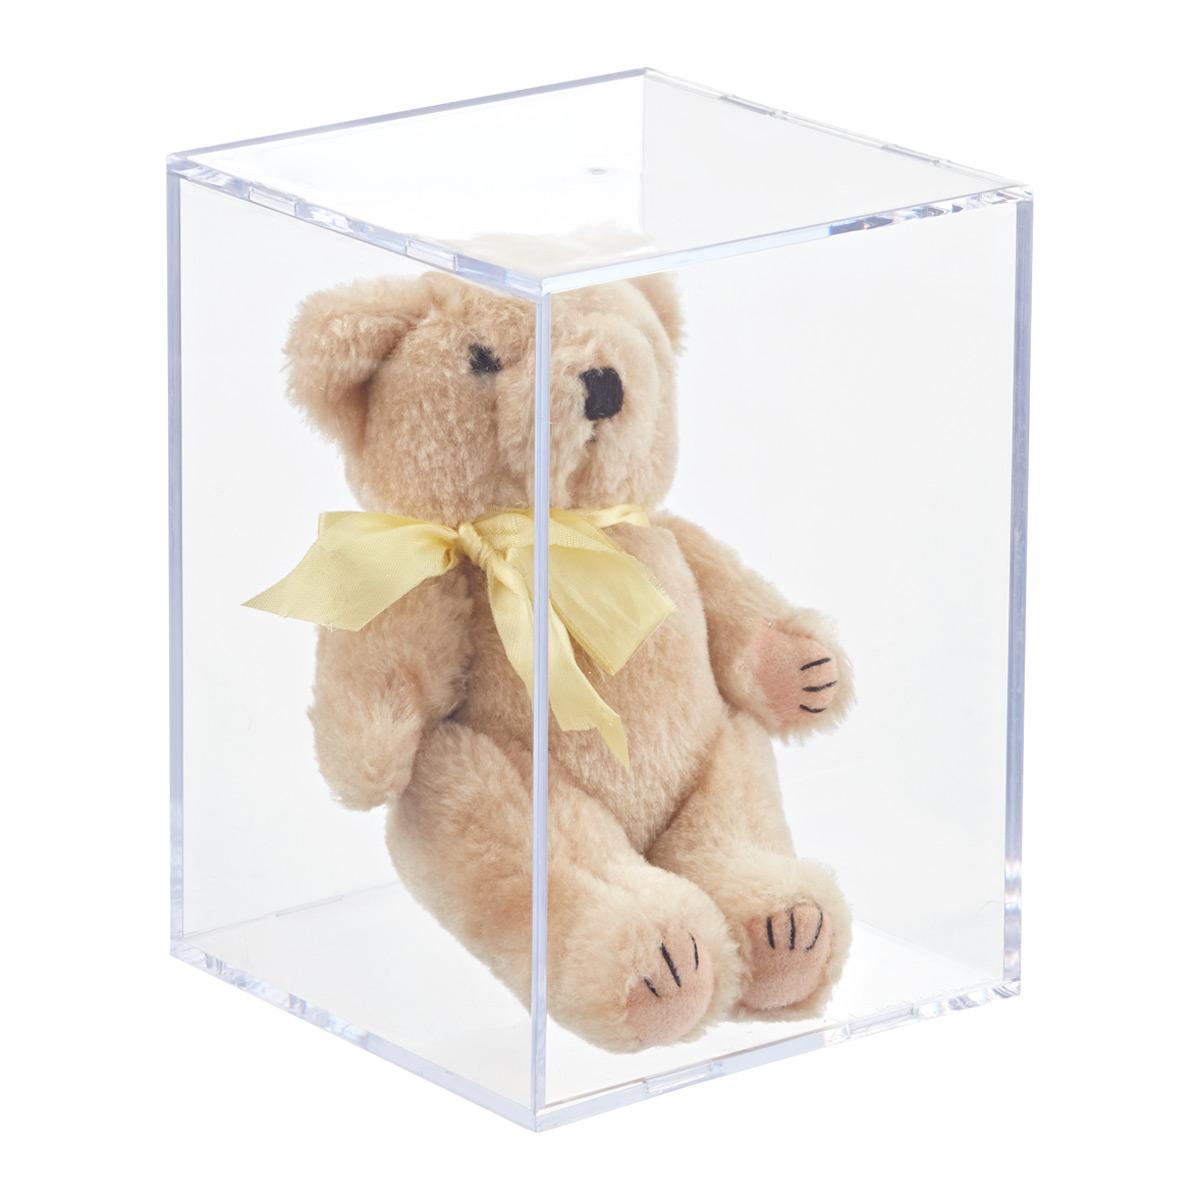 Plush Toy Display Cube